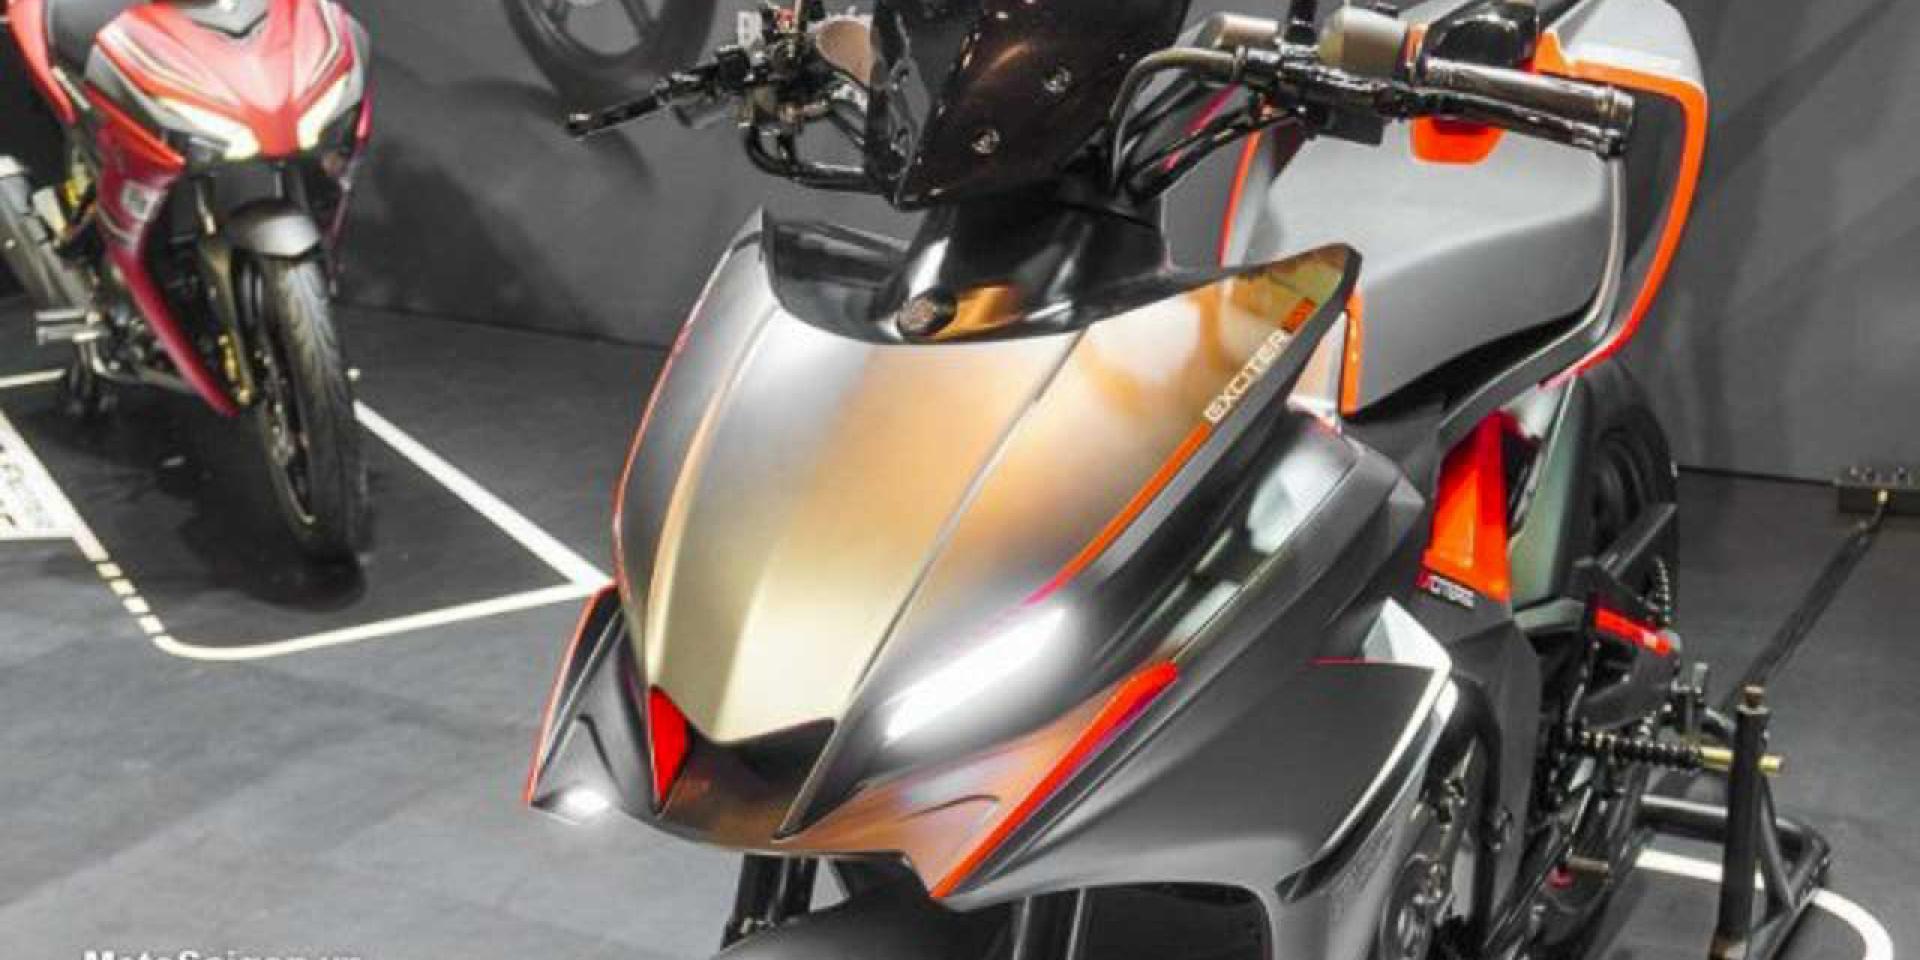 R-DNA注入、小翅膀上身。Yamaha F-155 Concept 超殺概念車